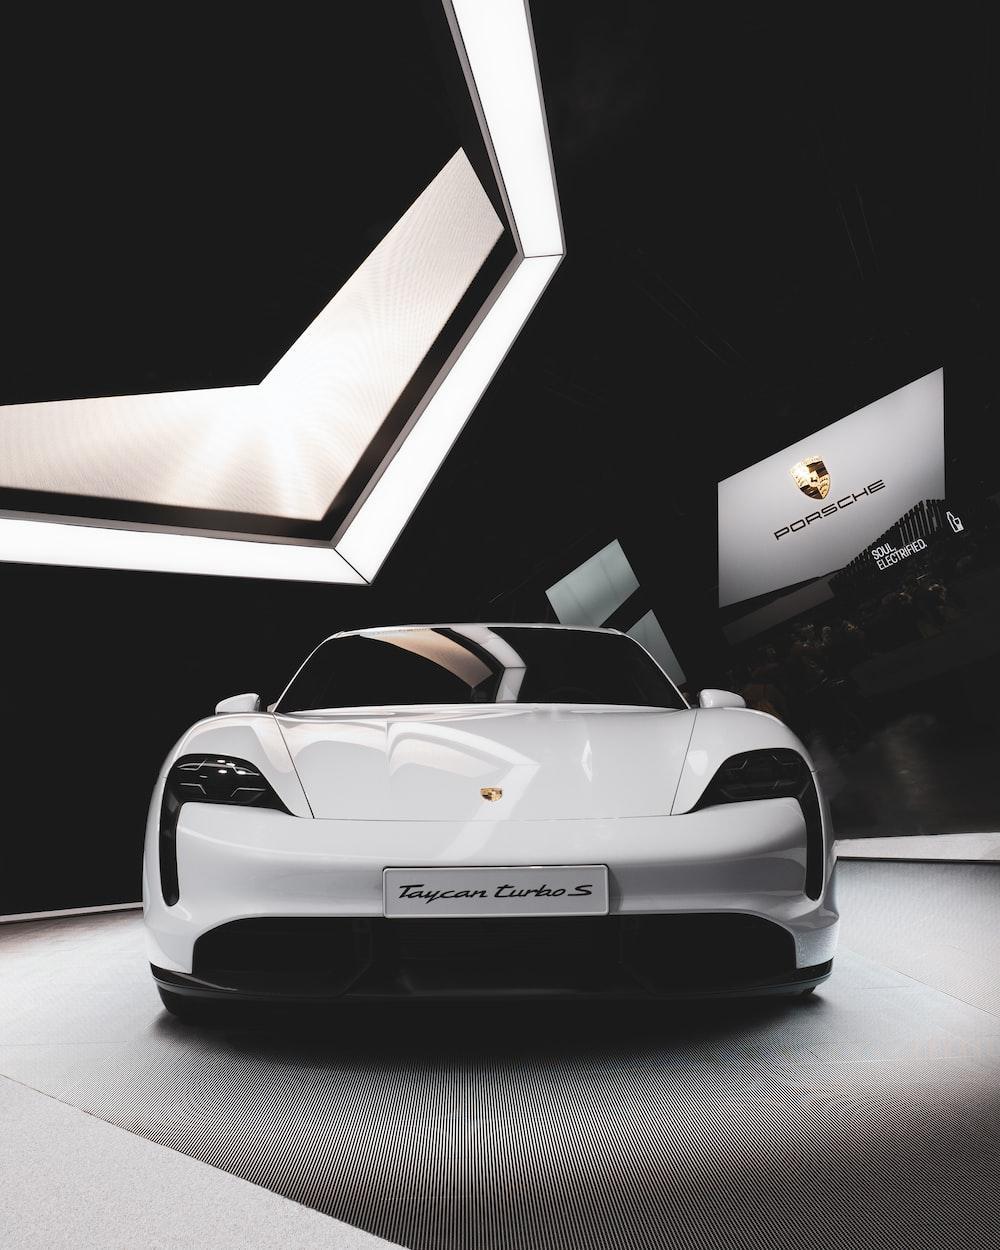 Porsche Taycan Pictures Download Free Images On Unsplash